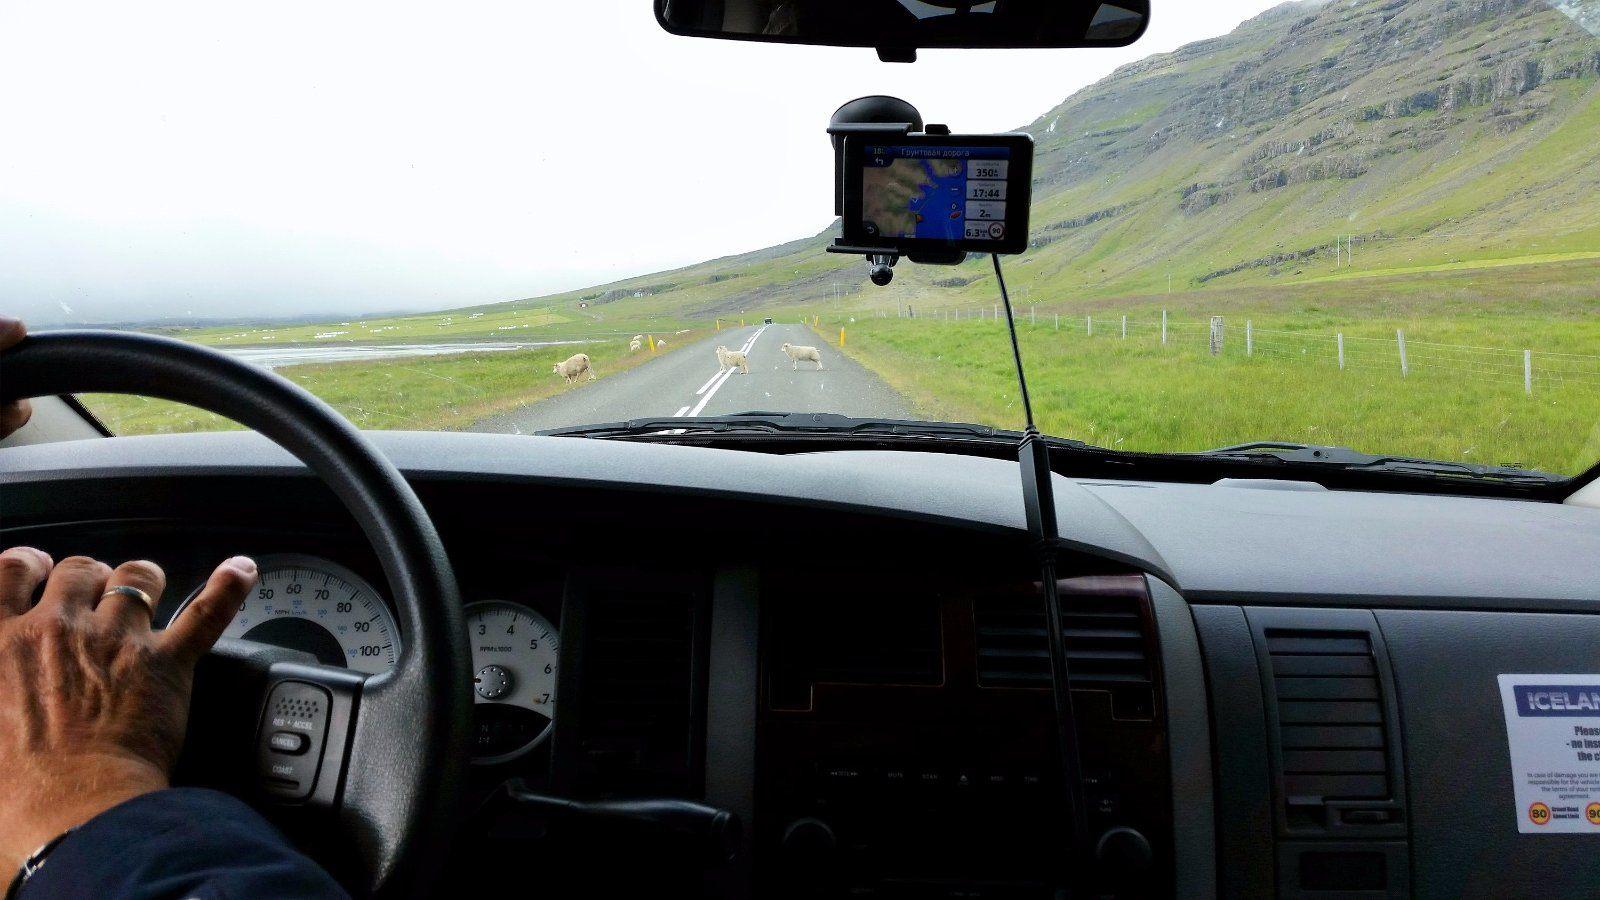 Заправка на навигаторе и овцы на дороге...